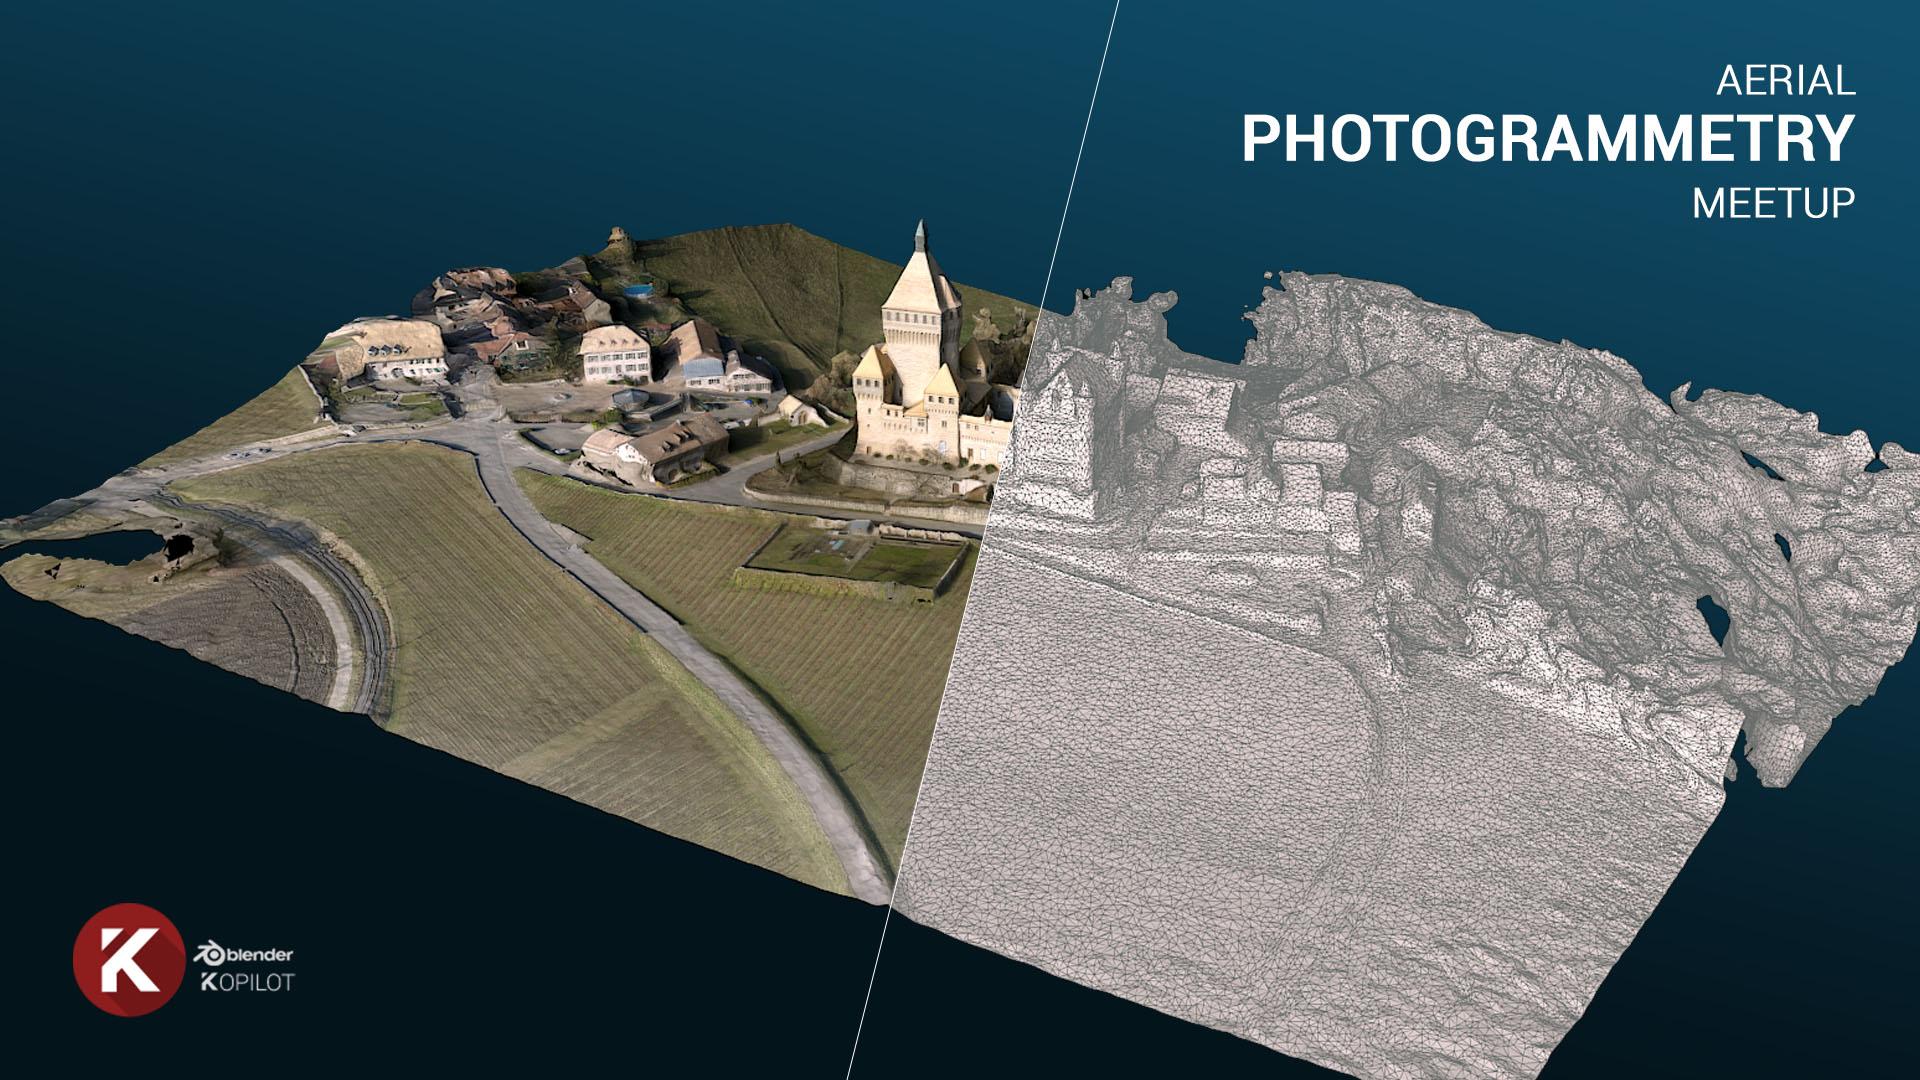 Aerial Photogrammetry Experiment